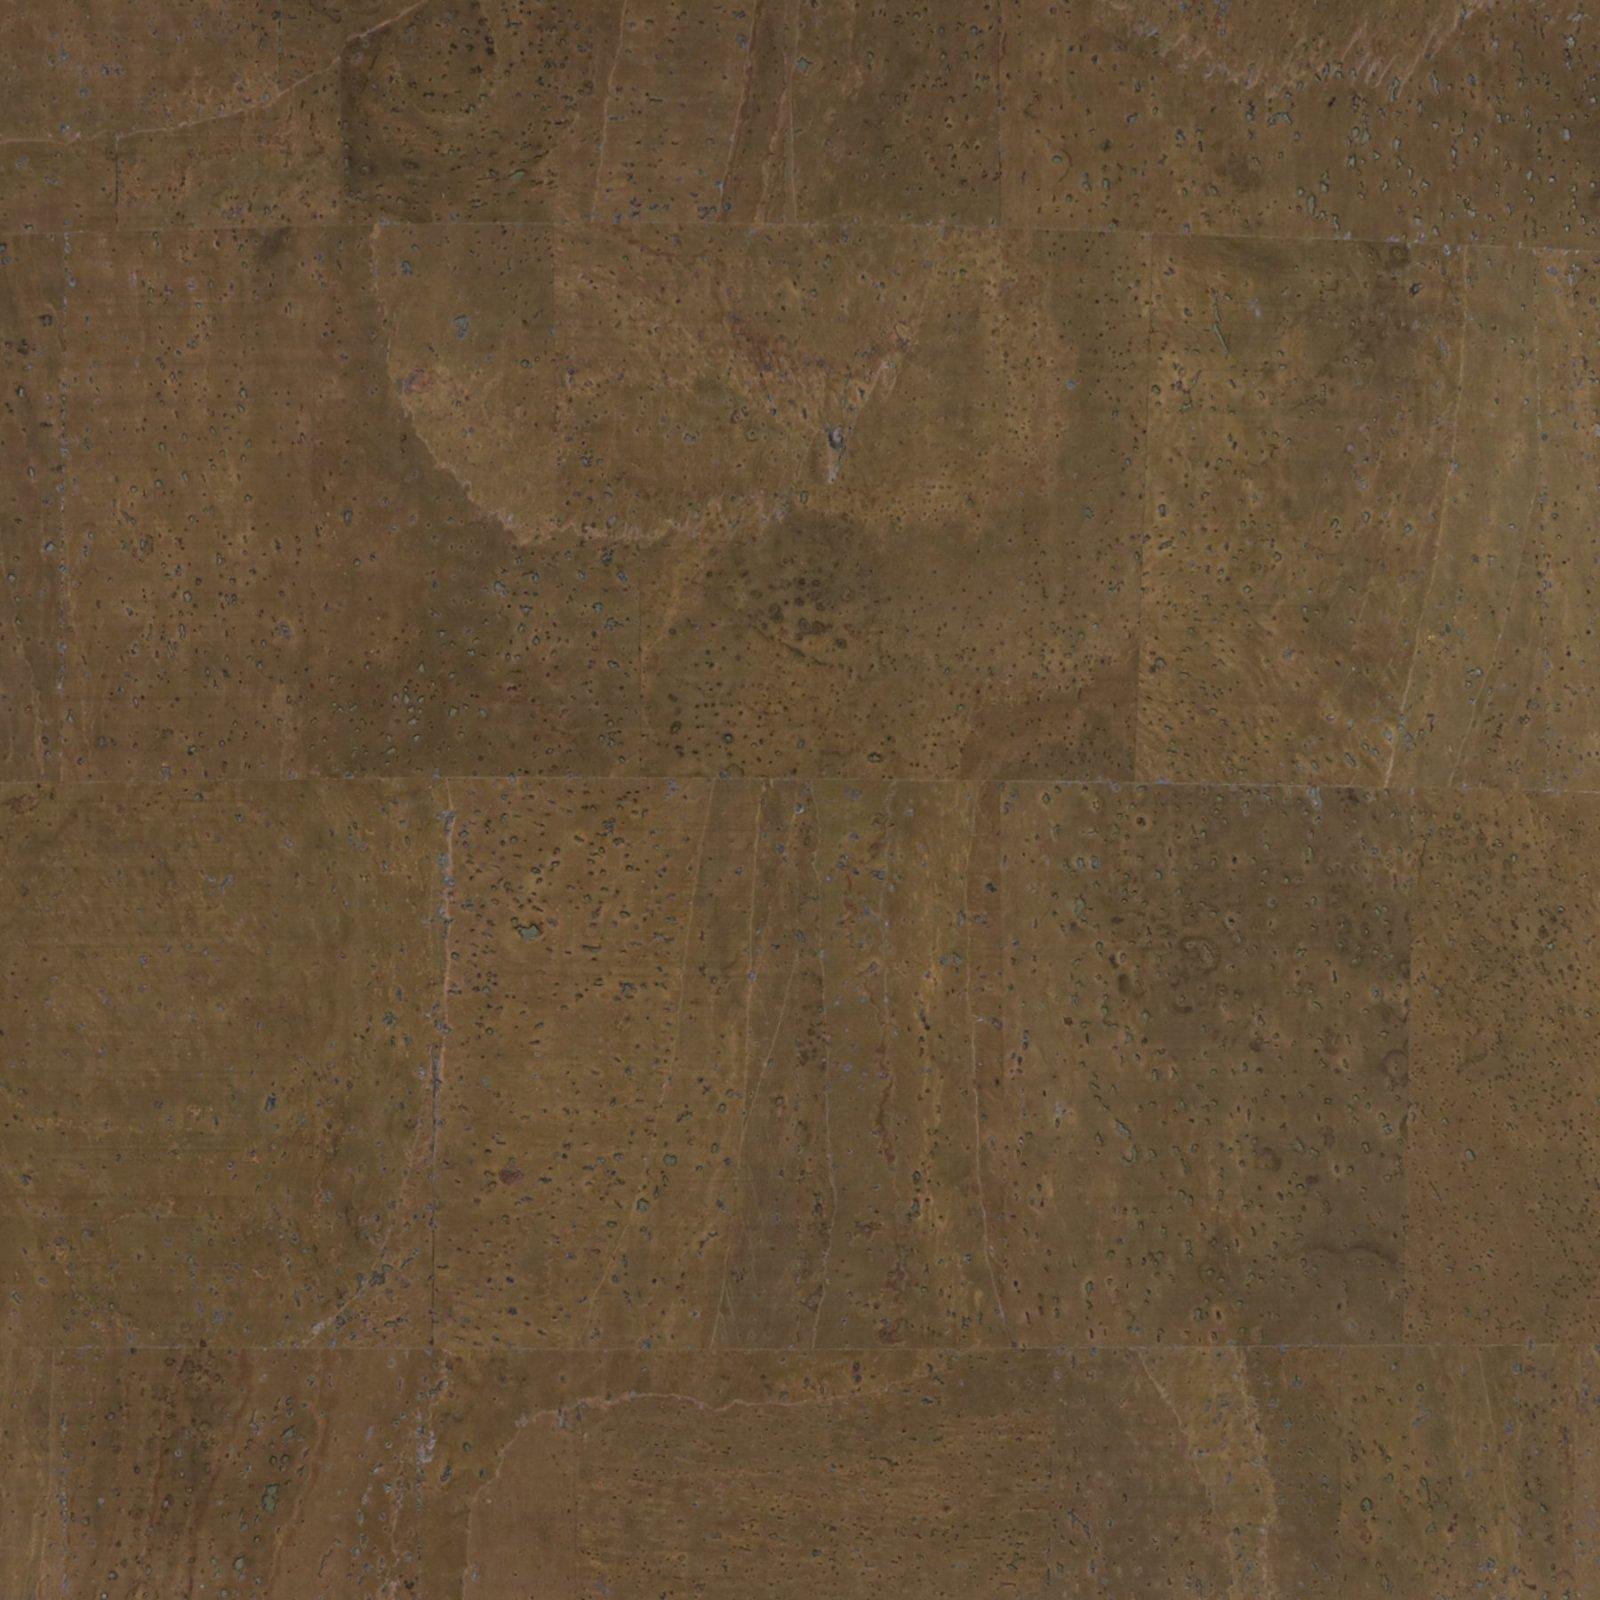 PRO Surface Mocha Cork Fabric